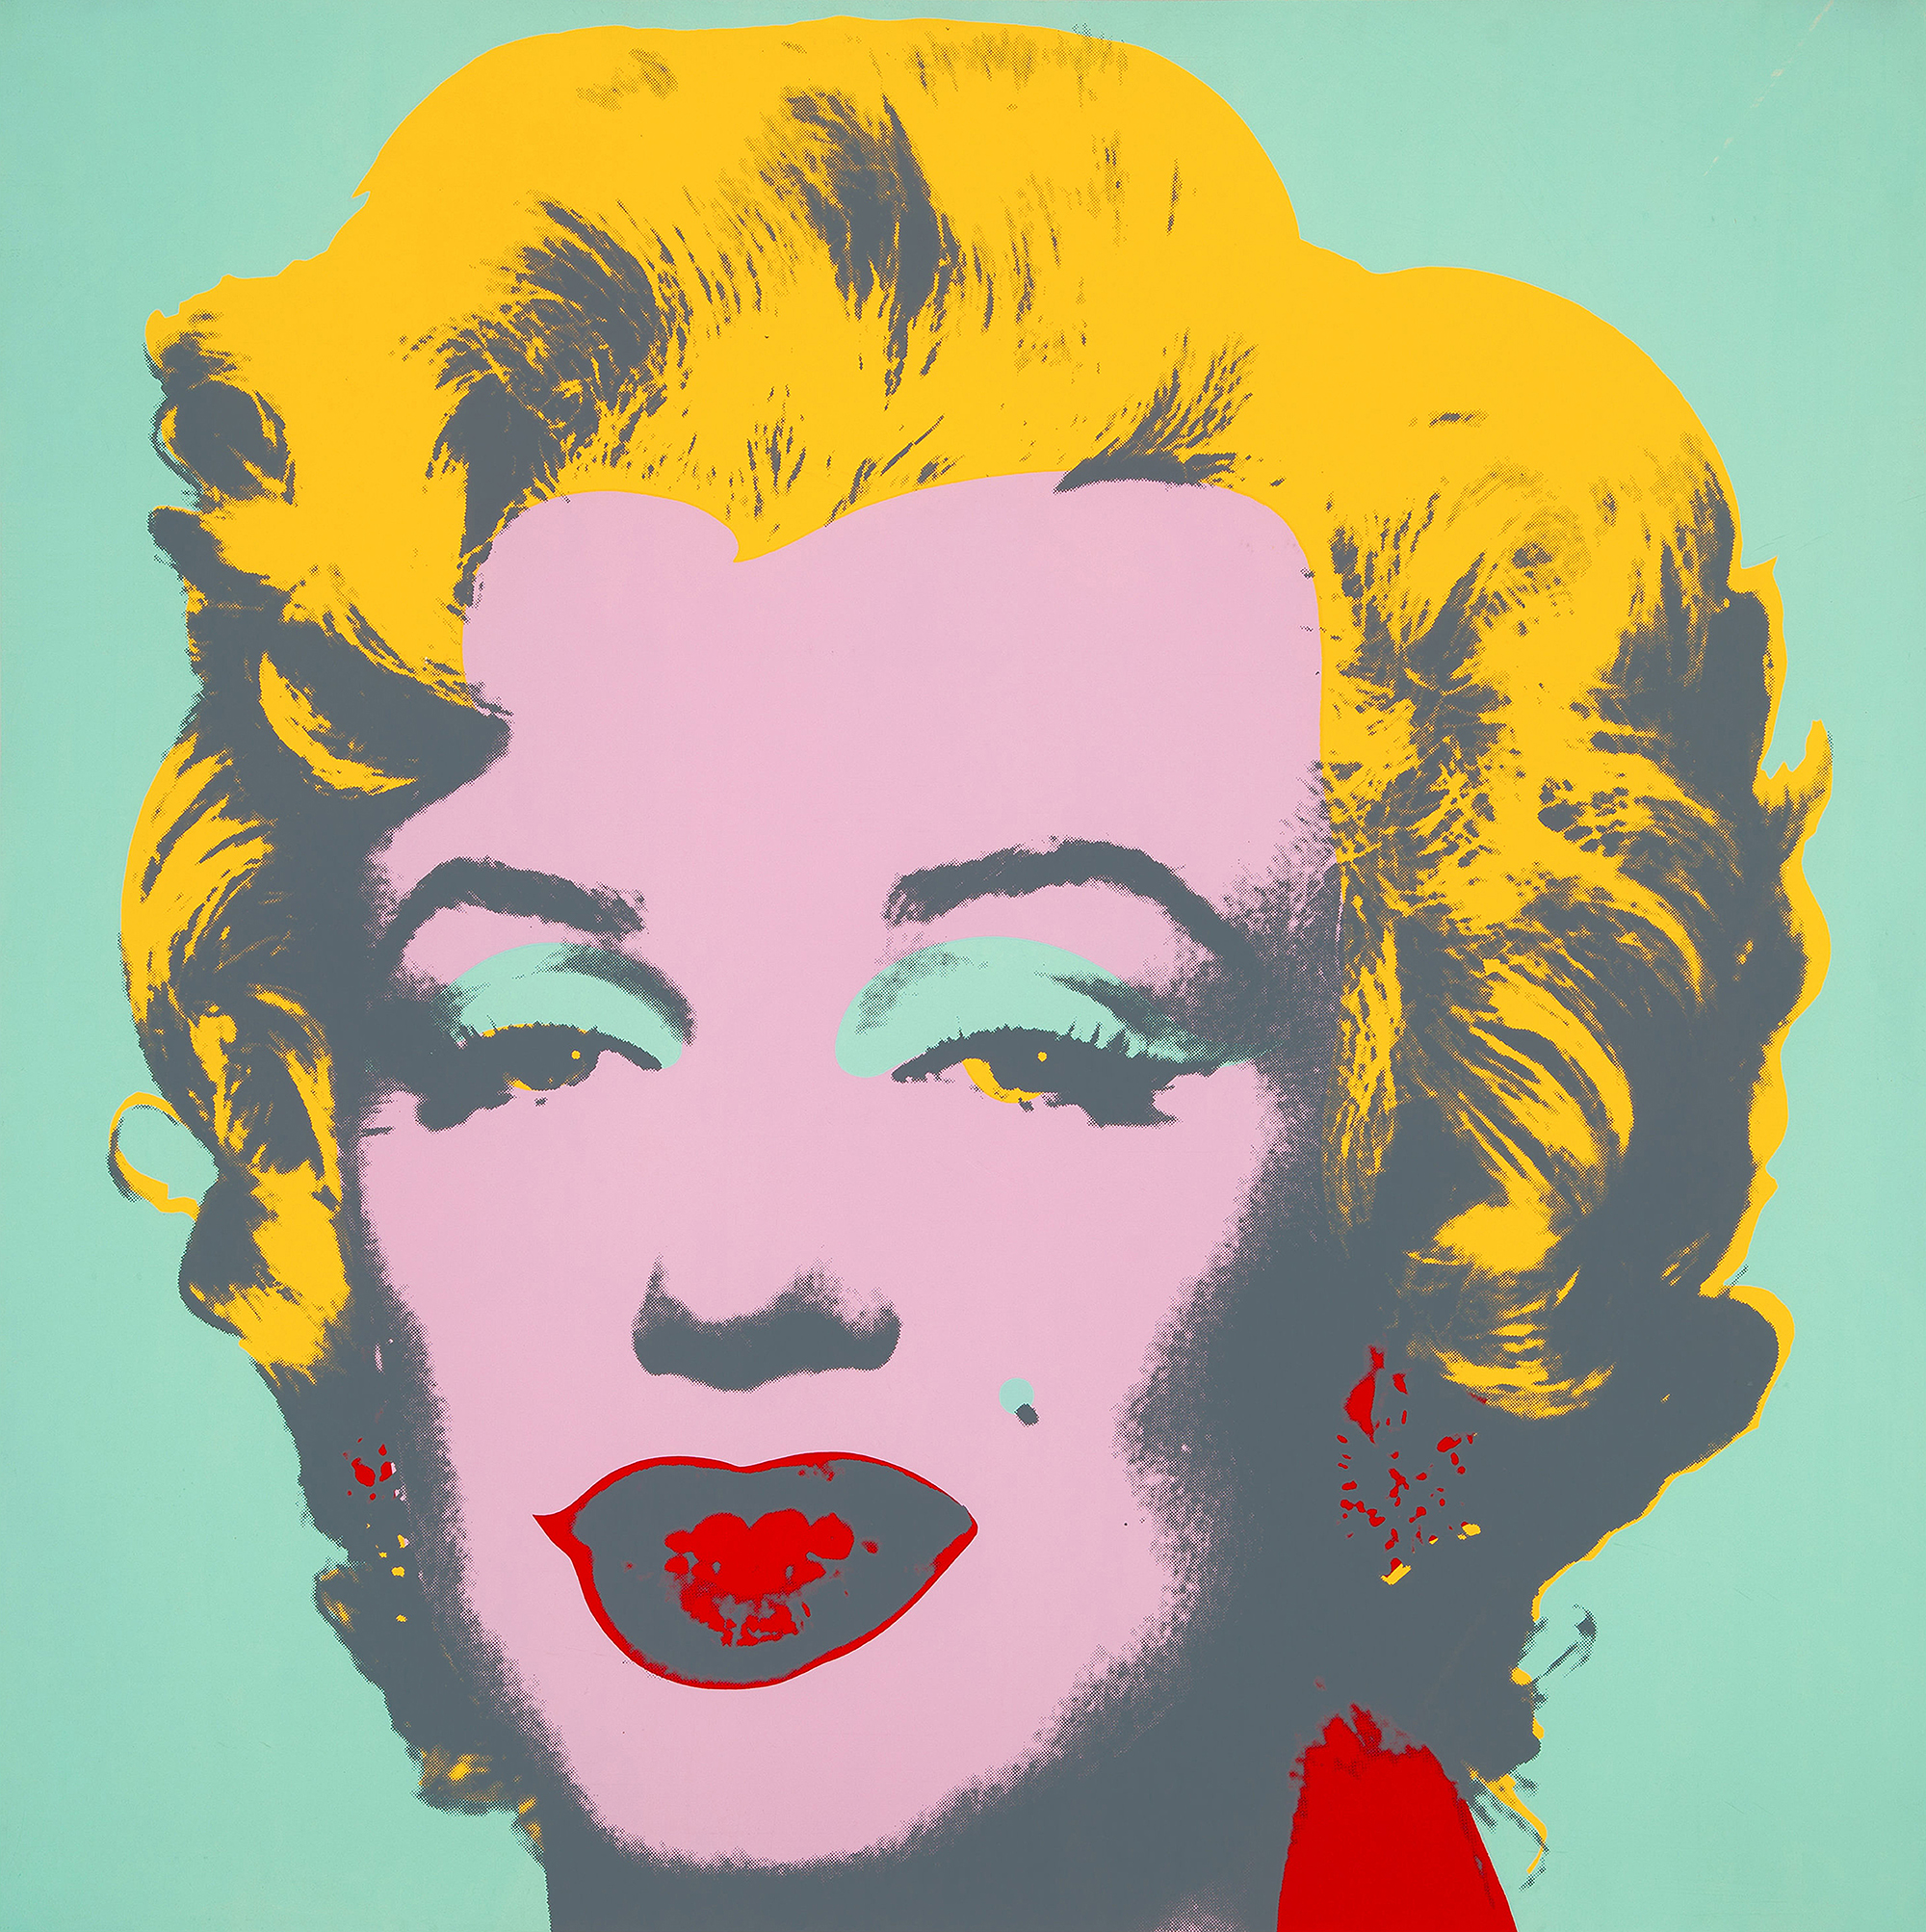 Andy Warhol, Marilyn Monroe (Marilyn), 1967, Screen Print (S)